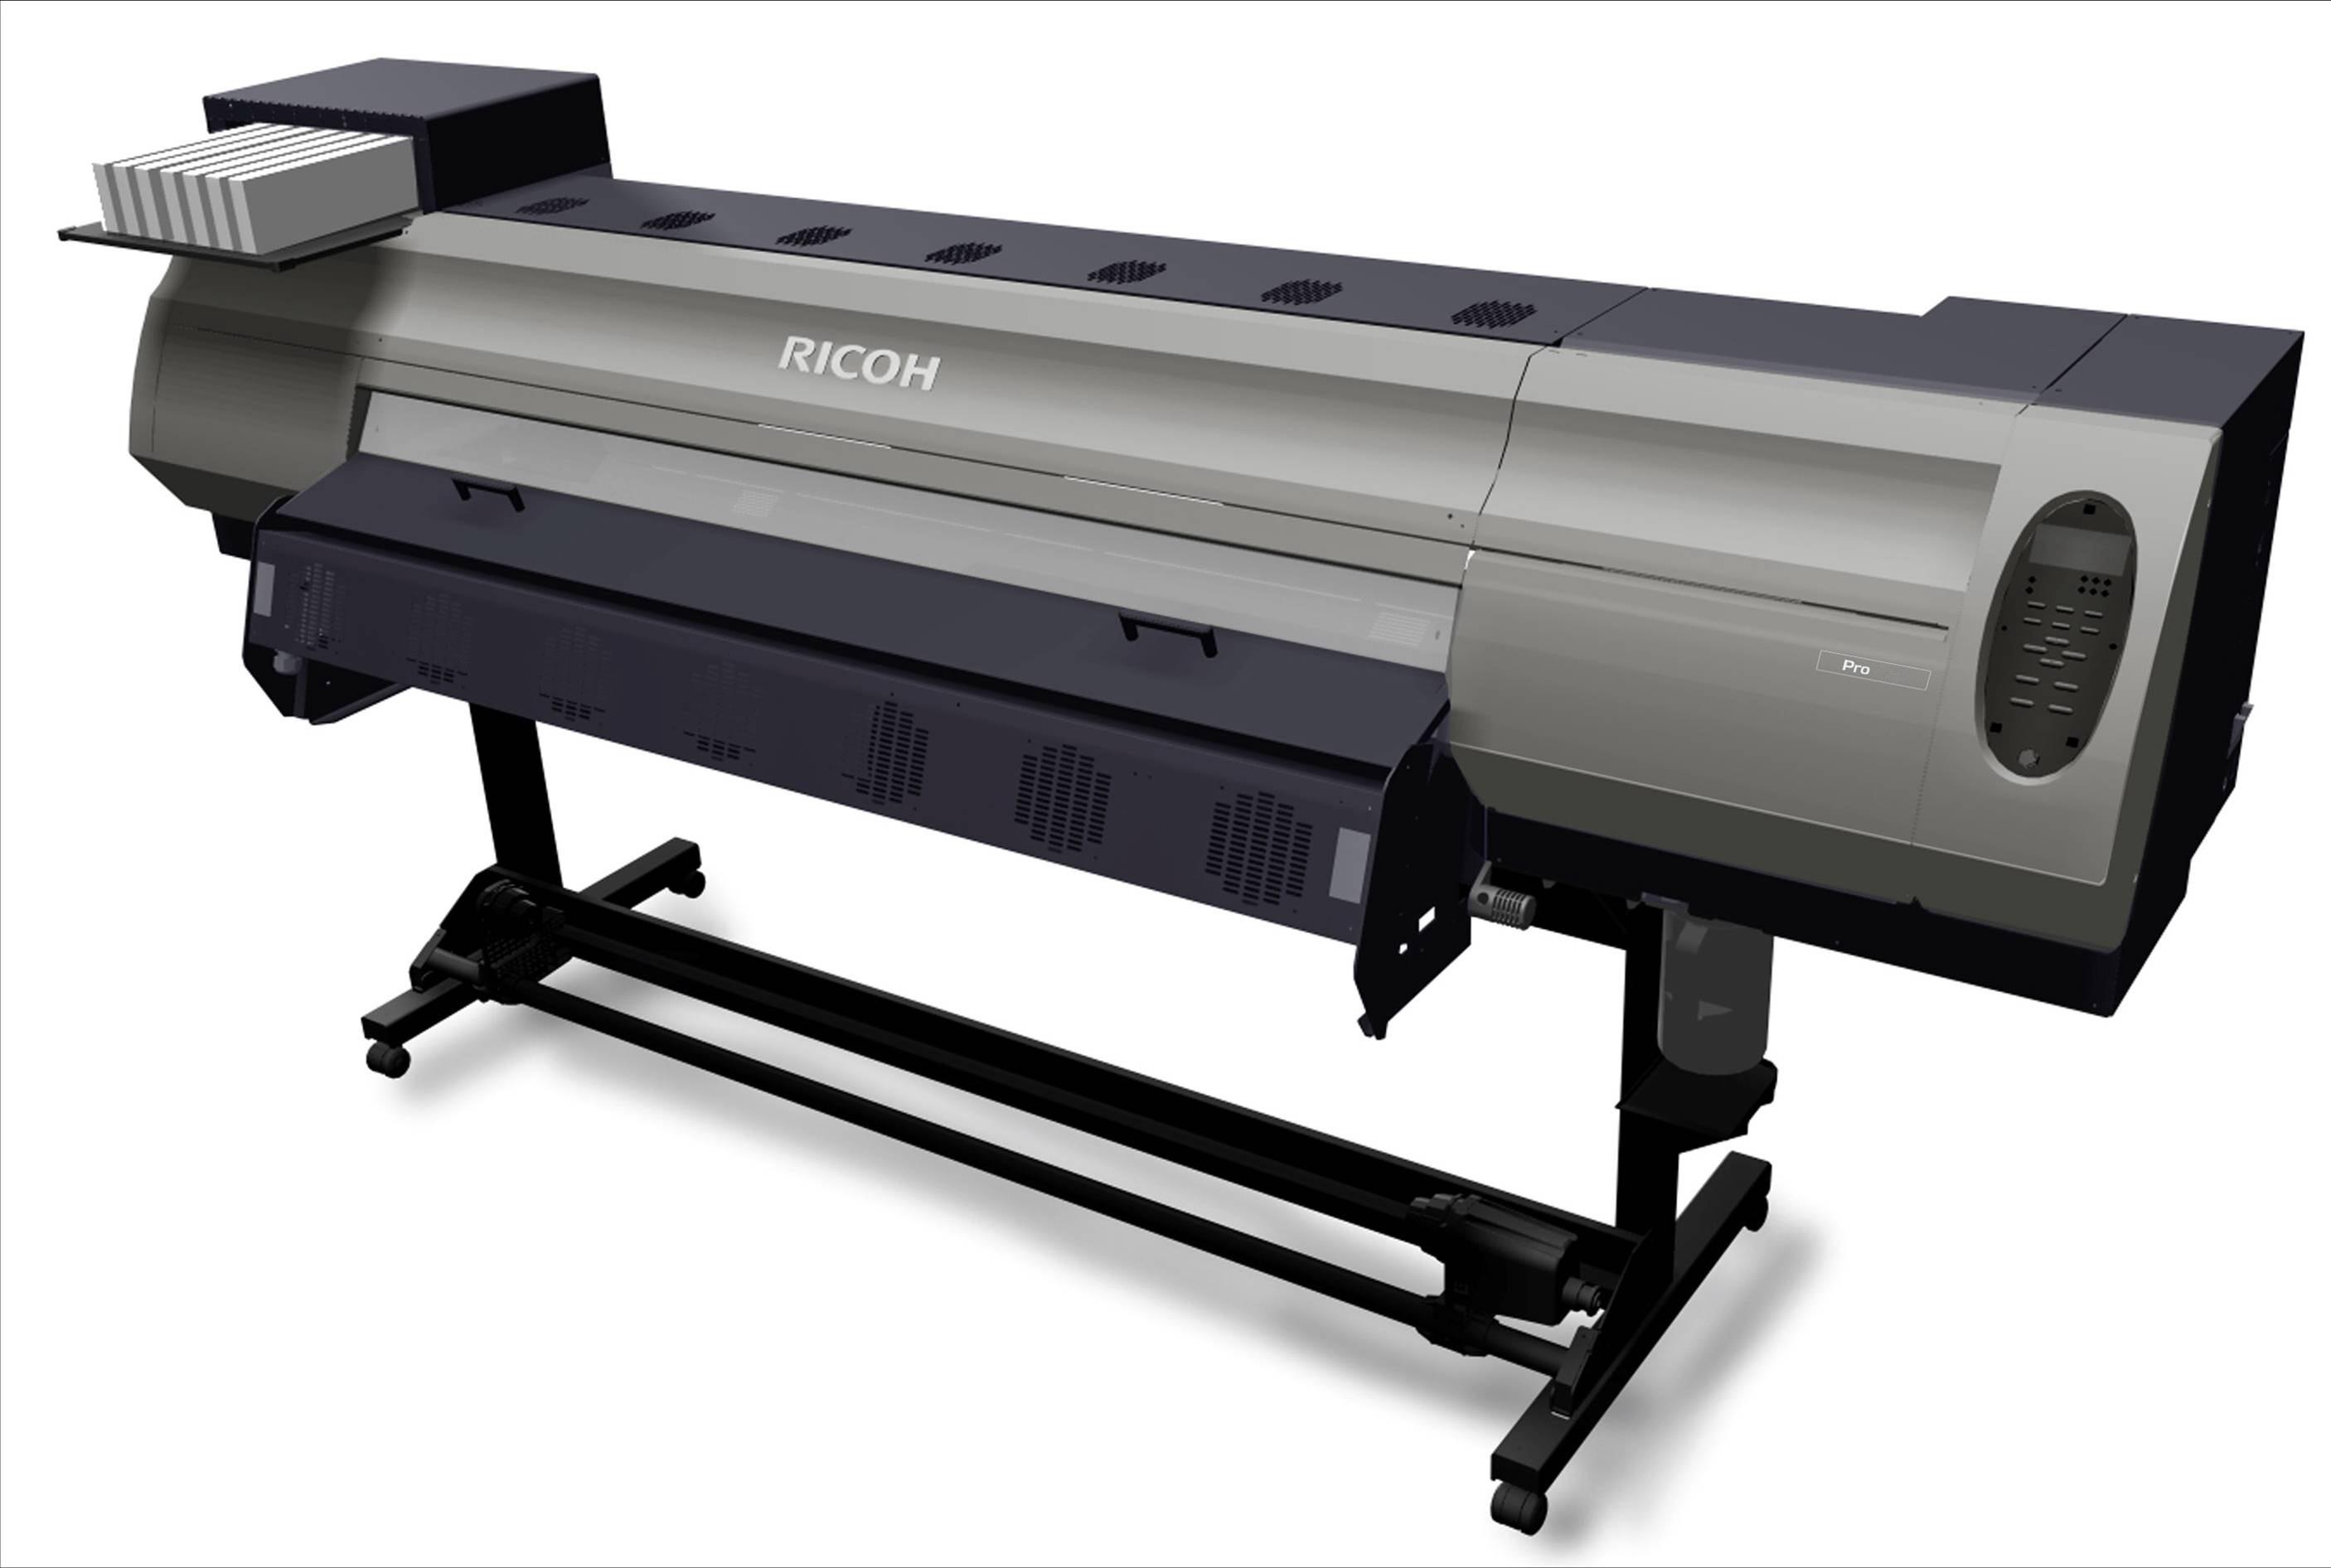 Ricoh Pro L4000 series